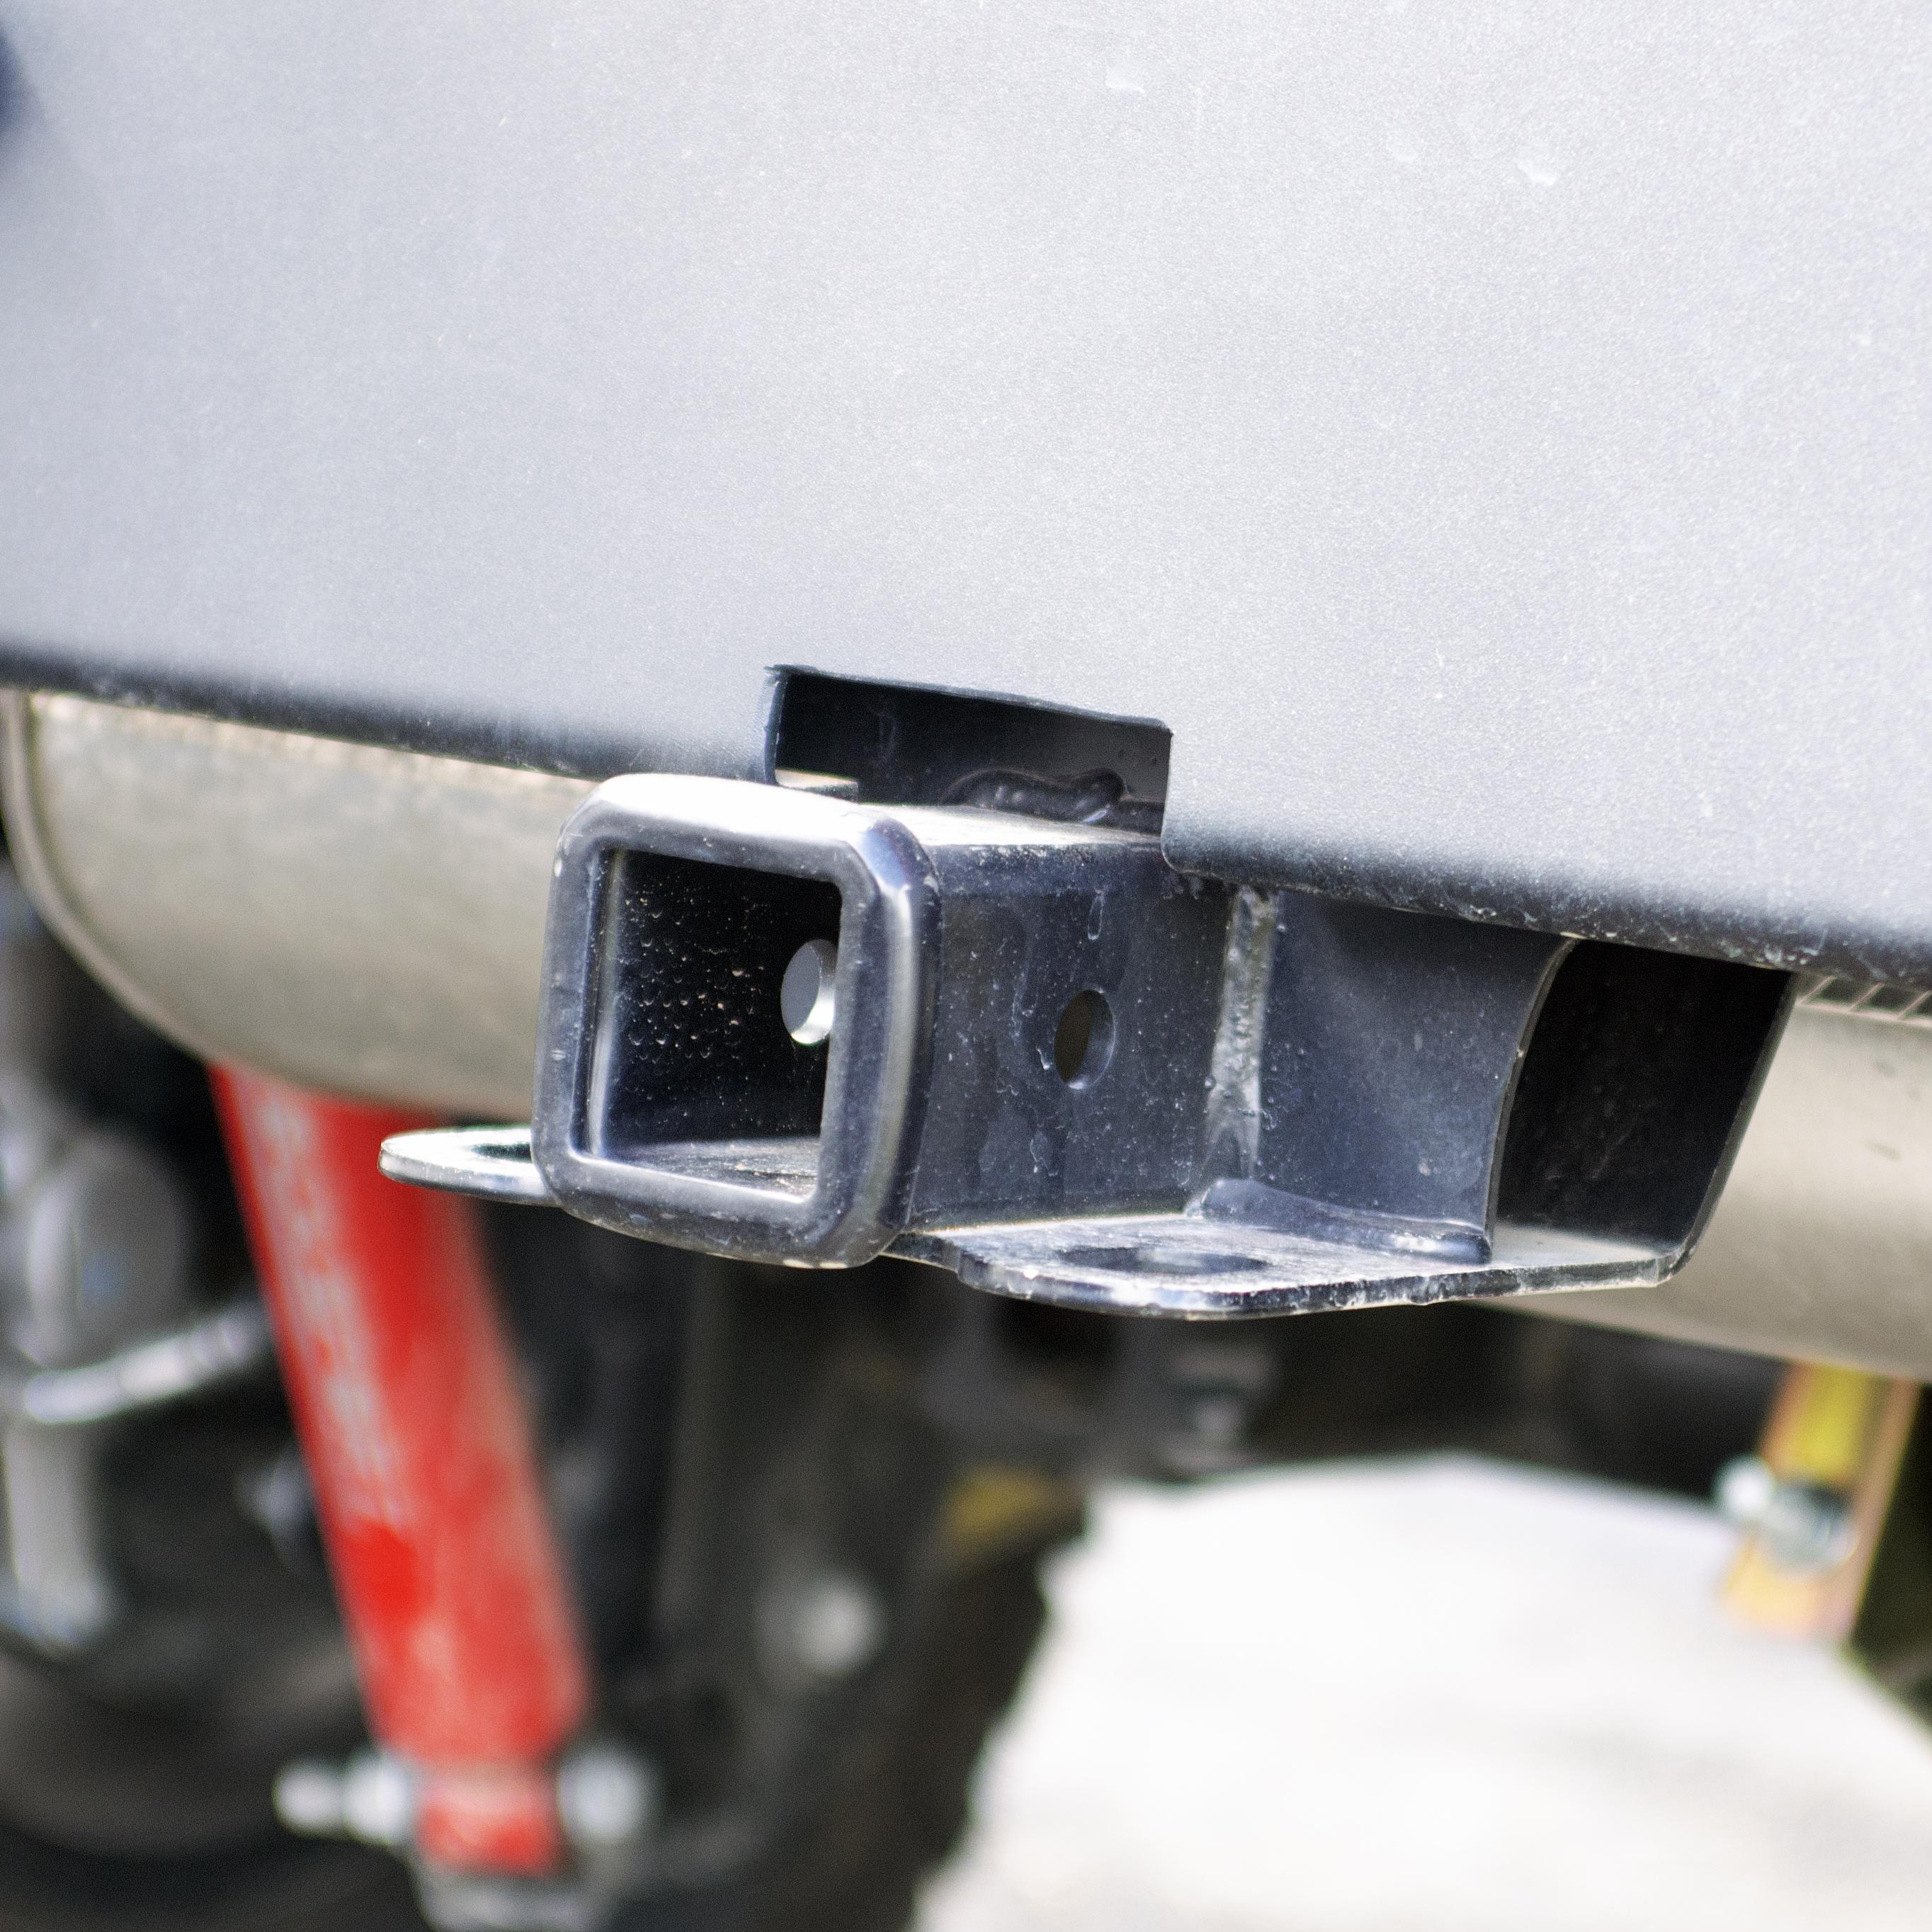 MetalCloak JL Wranger Full Width Rear Bumper Tow Hitch